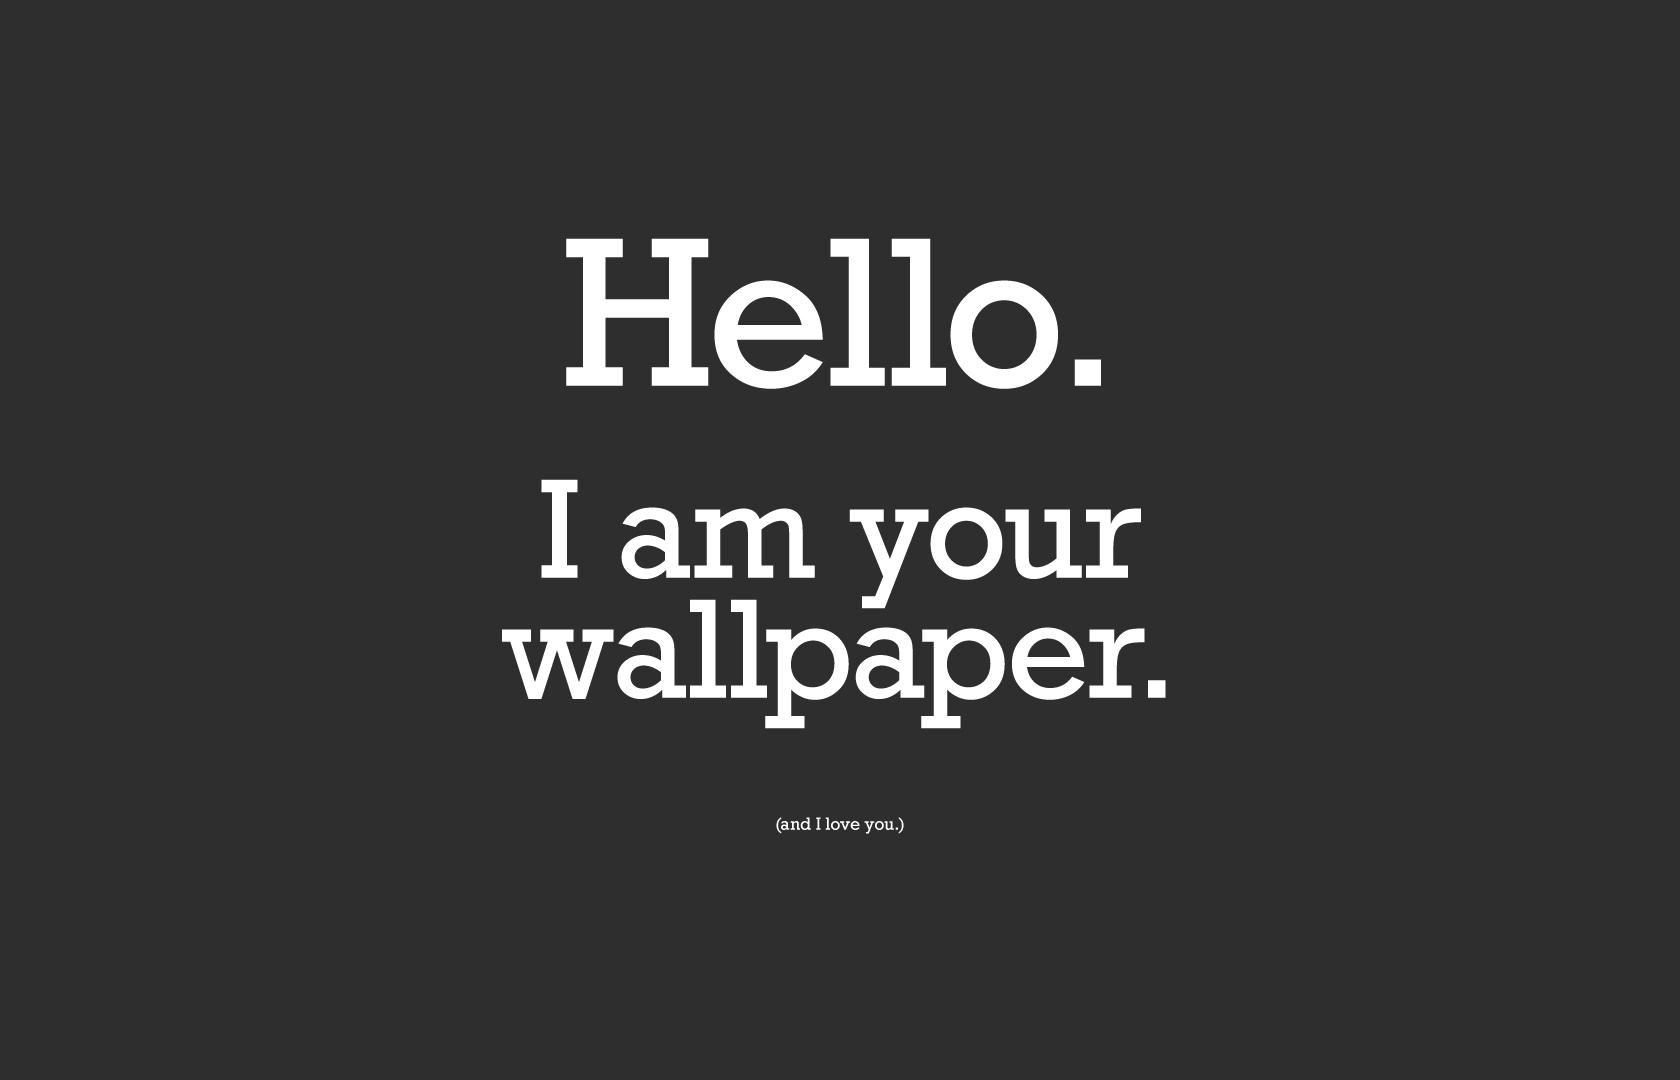 funny desktop hd wallpapers cool pictures widescreen funny desktop hd 1680x1080